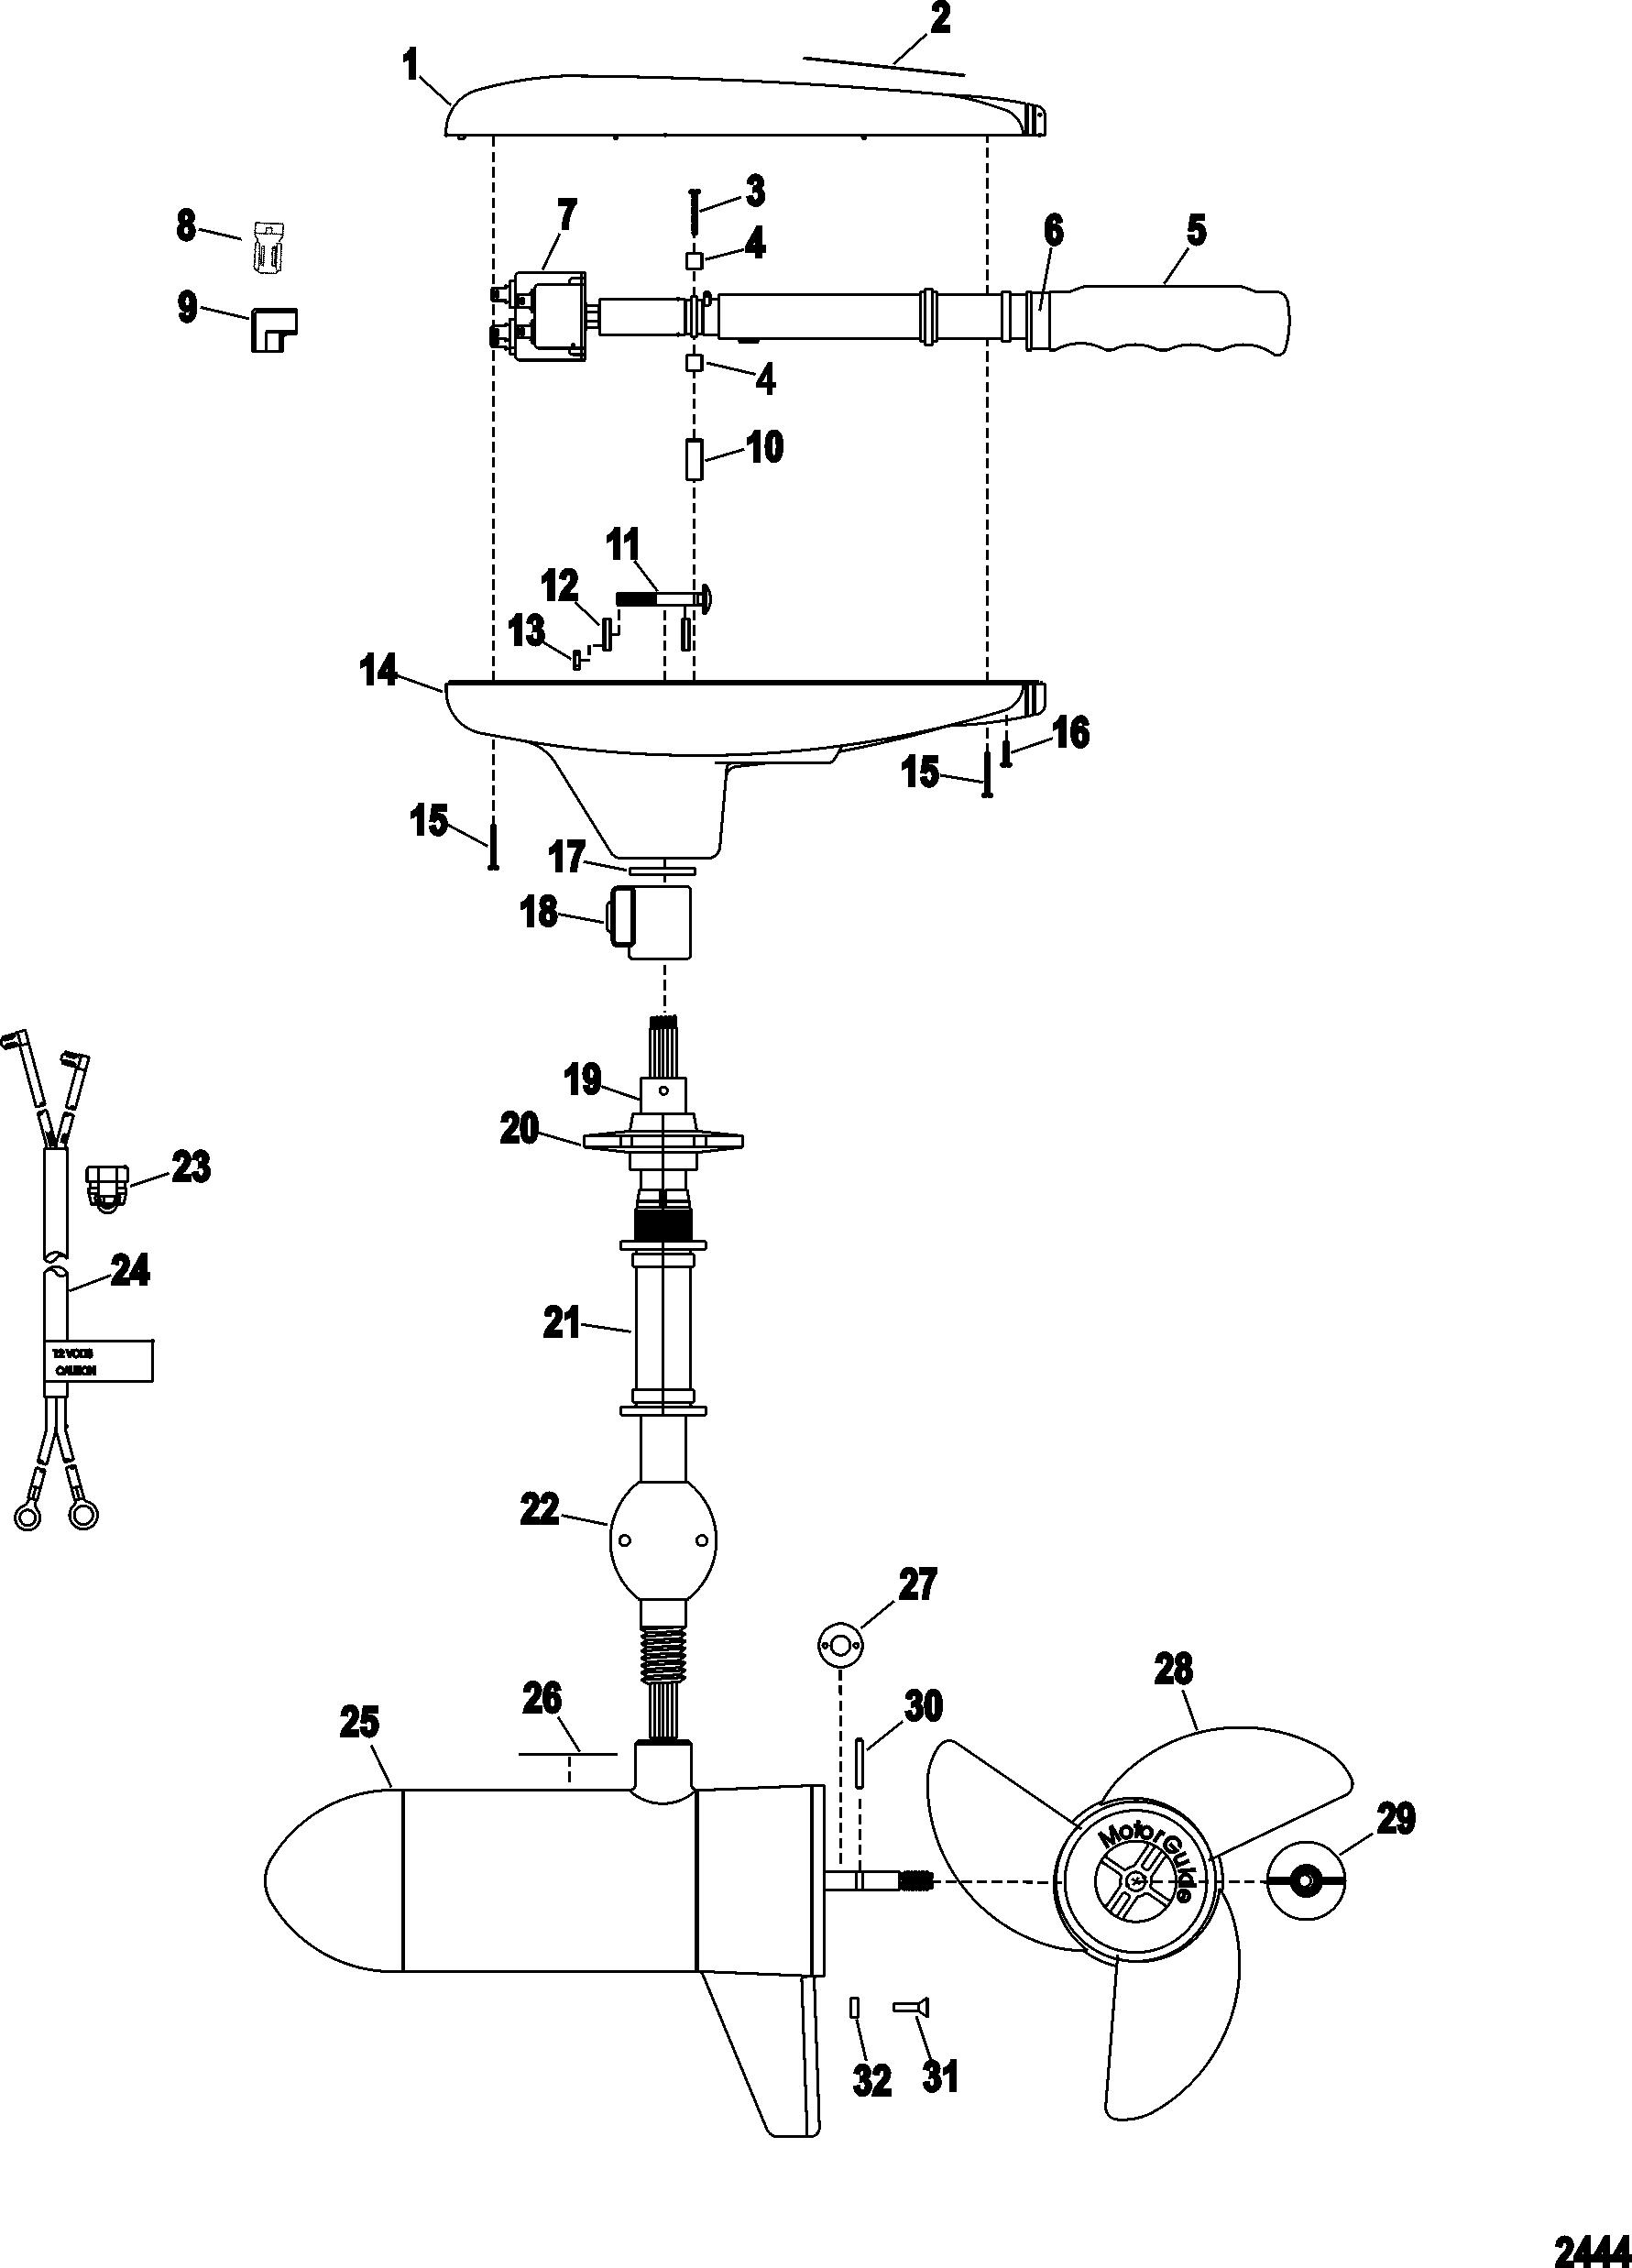 24v trolling motor wiring diagram 33 wiring diagram for Motorguide trolling motor wiring diagram